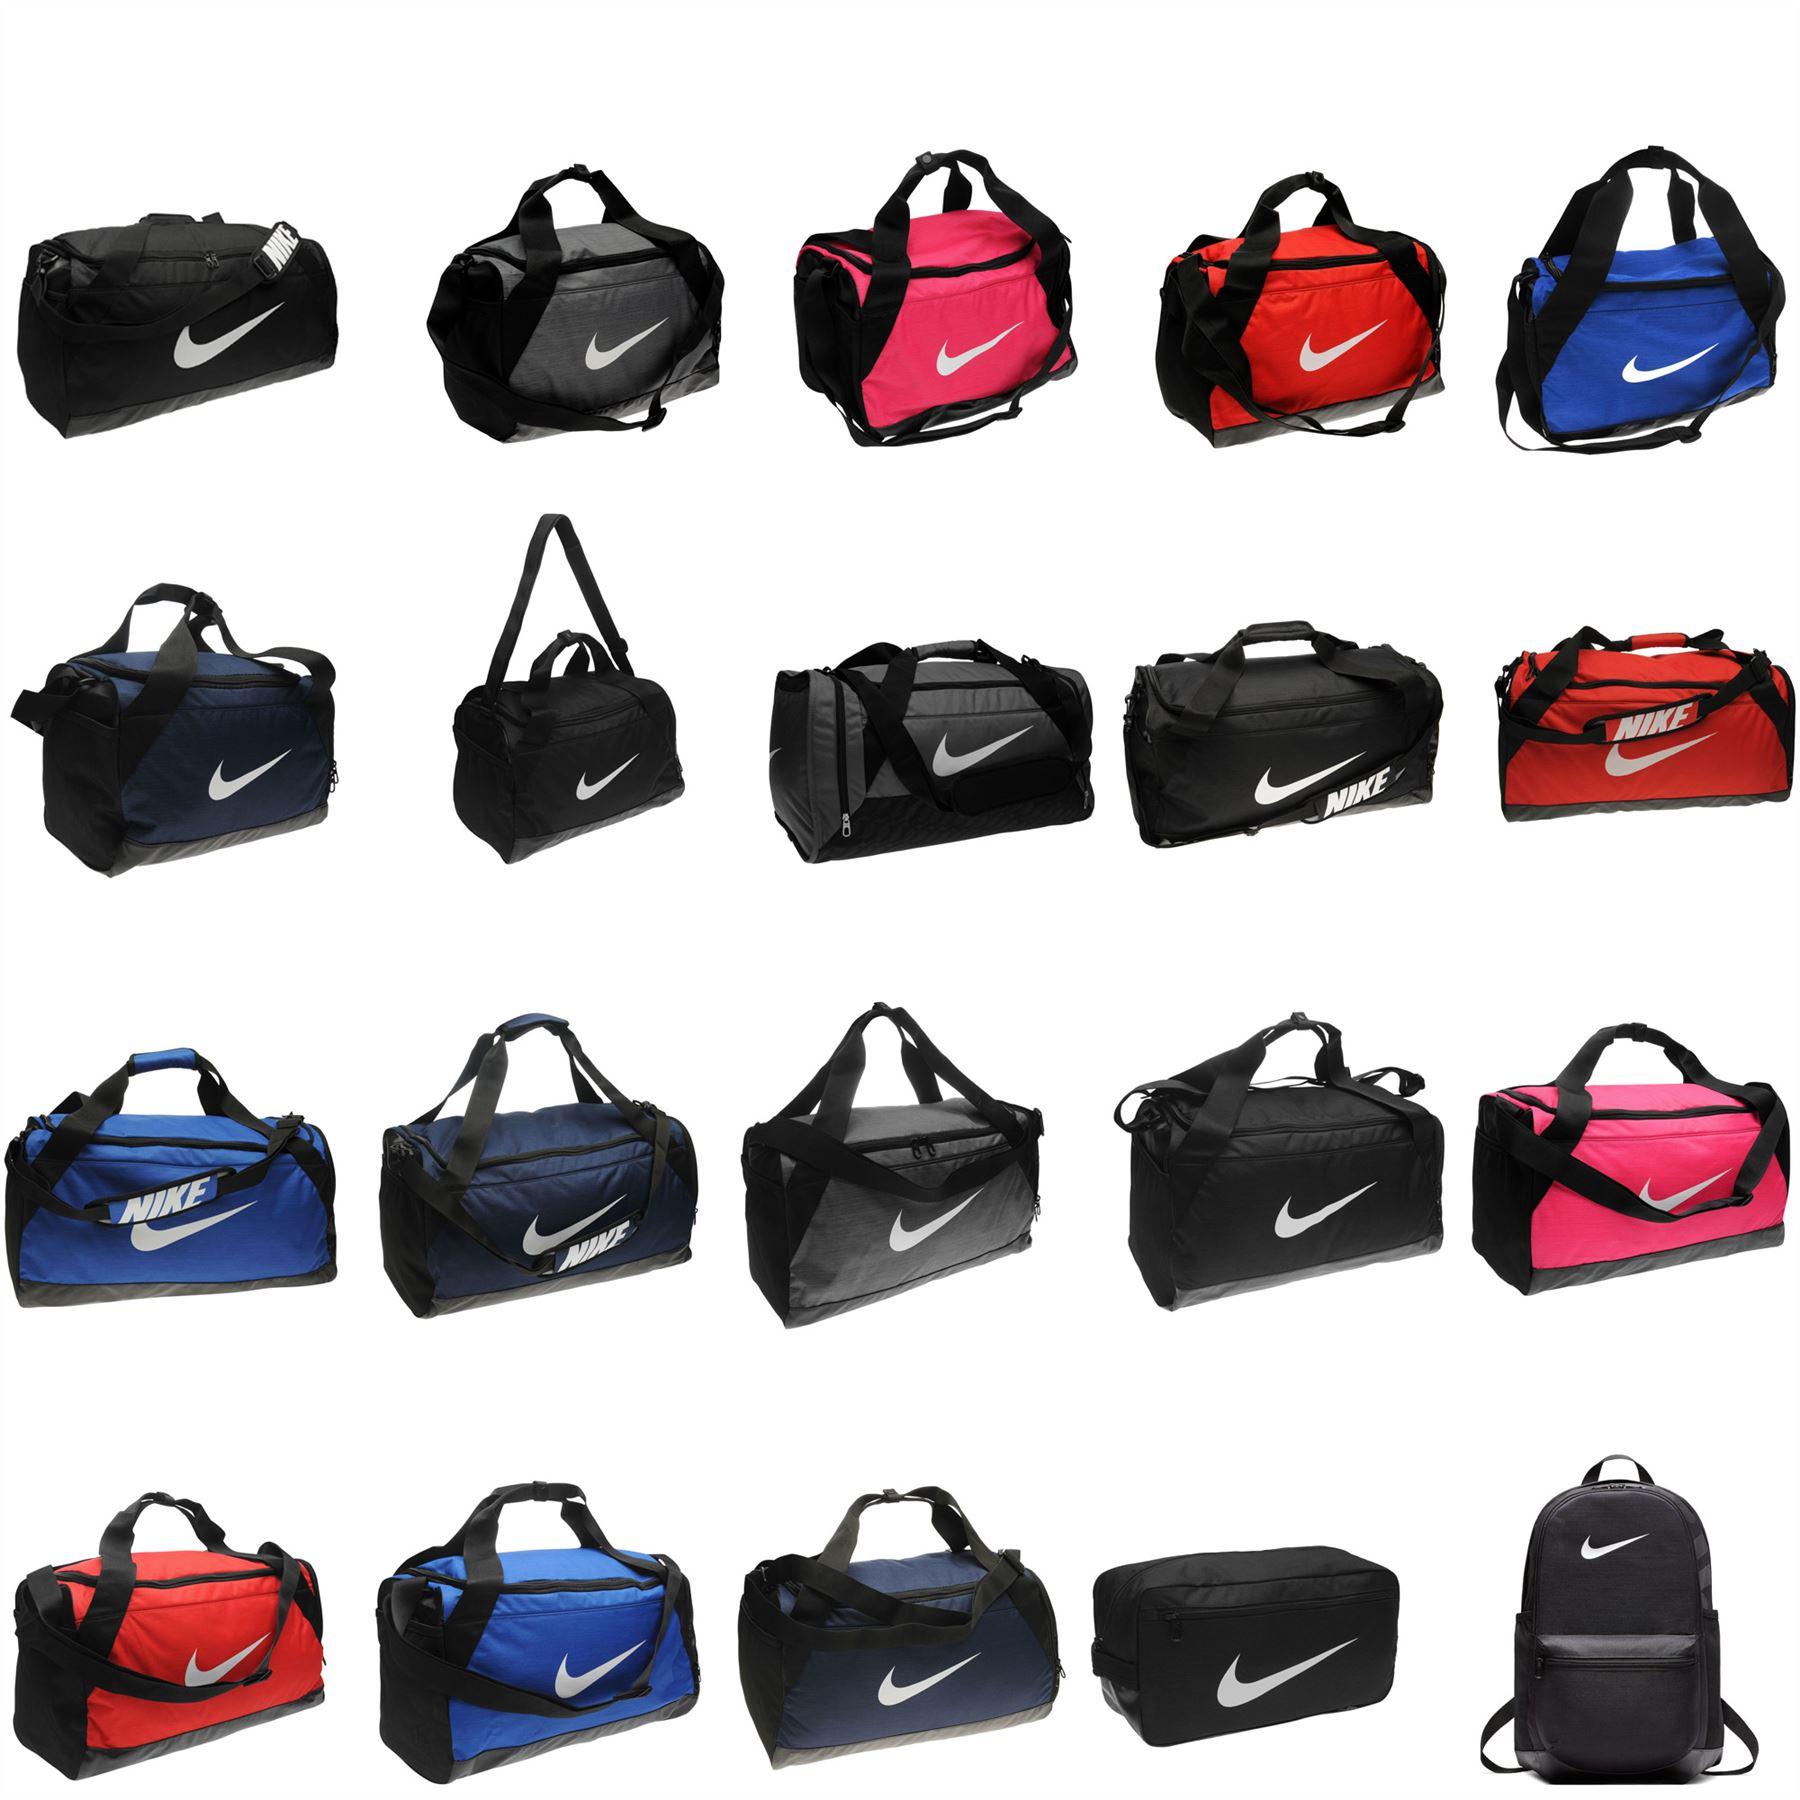 Nike Brasilia Bags Holdalls Shoebag Backpack Sports Bag